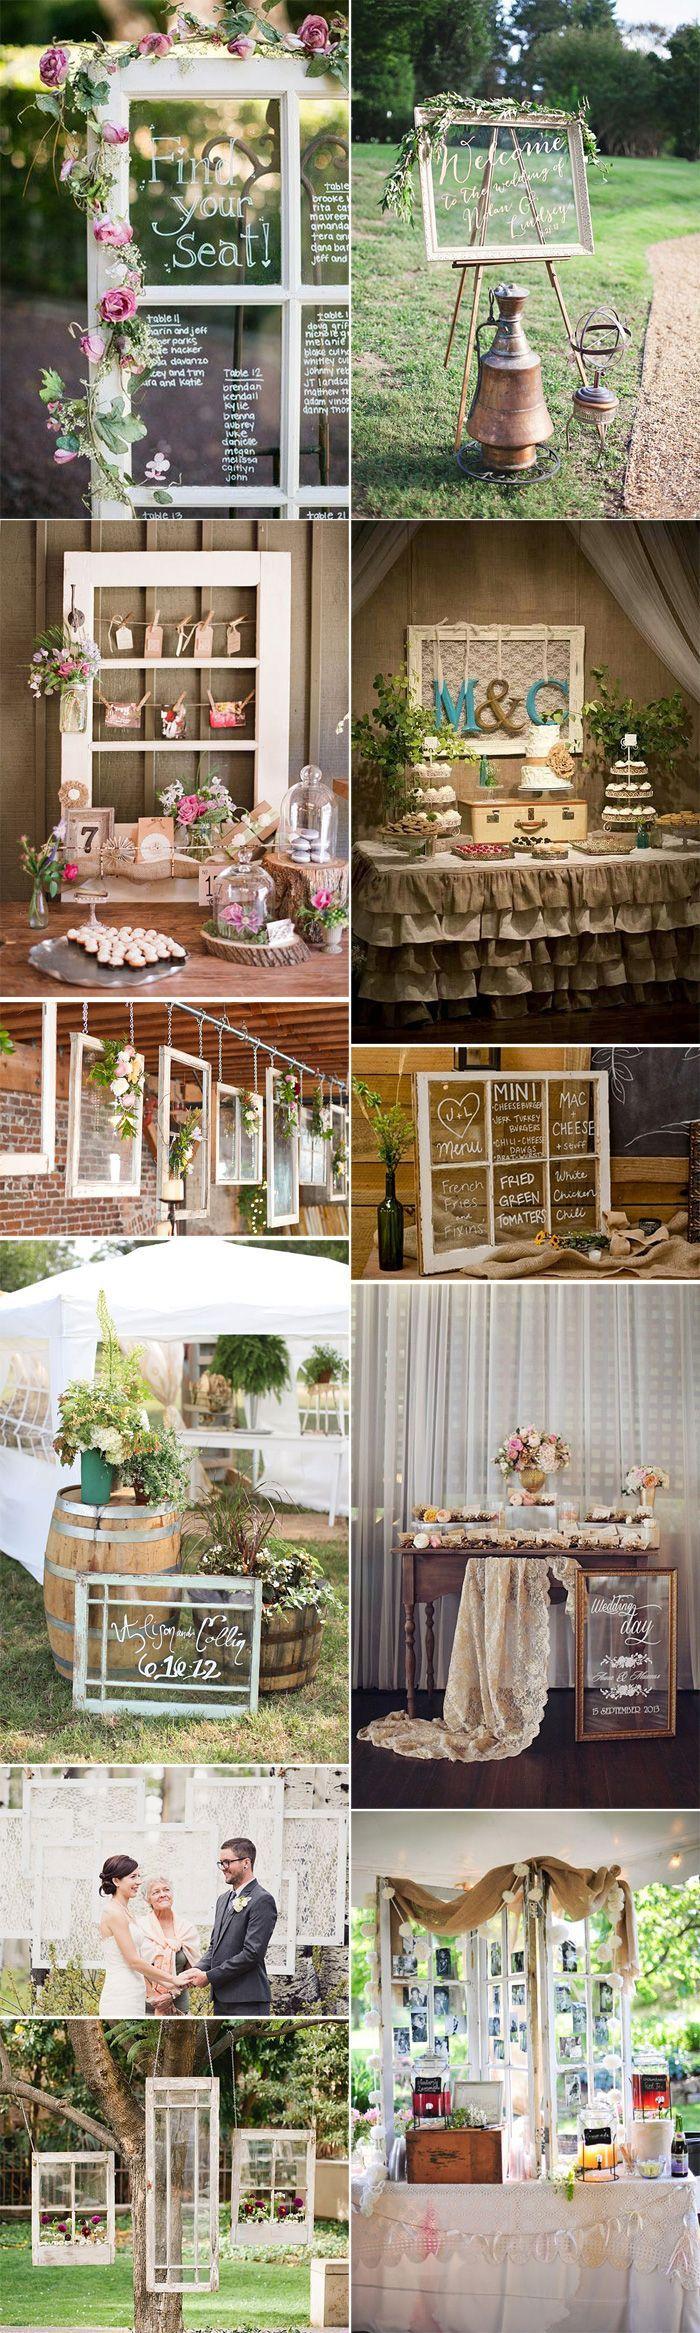 Marcos de ventana antiguos: 10 ideas para decorar bodas | Marcos de ...